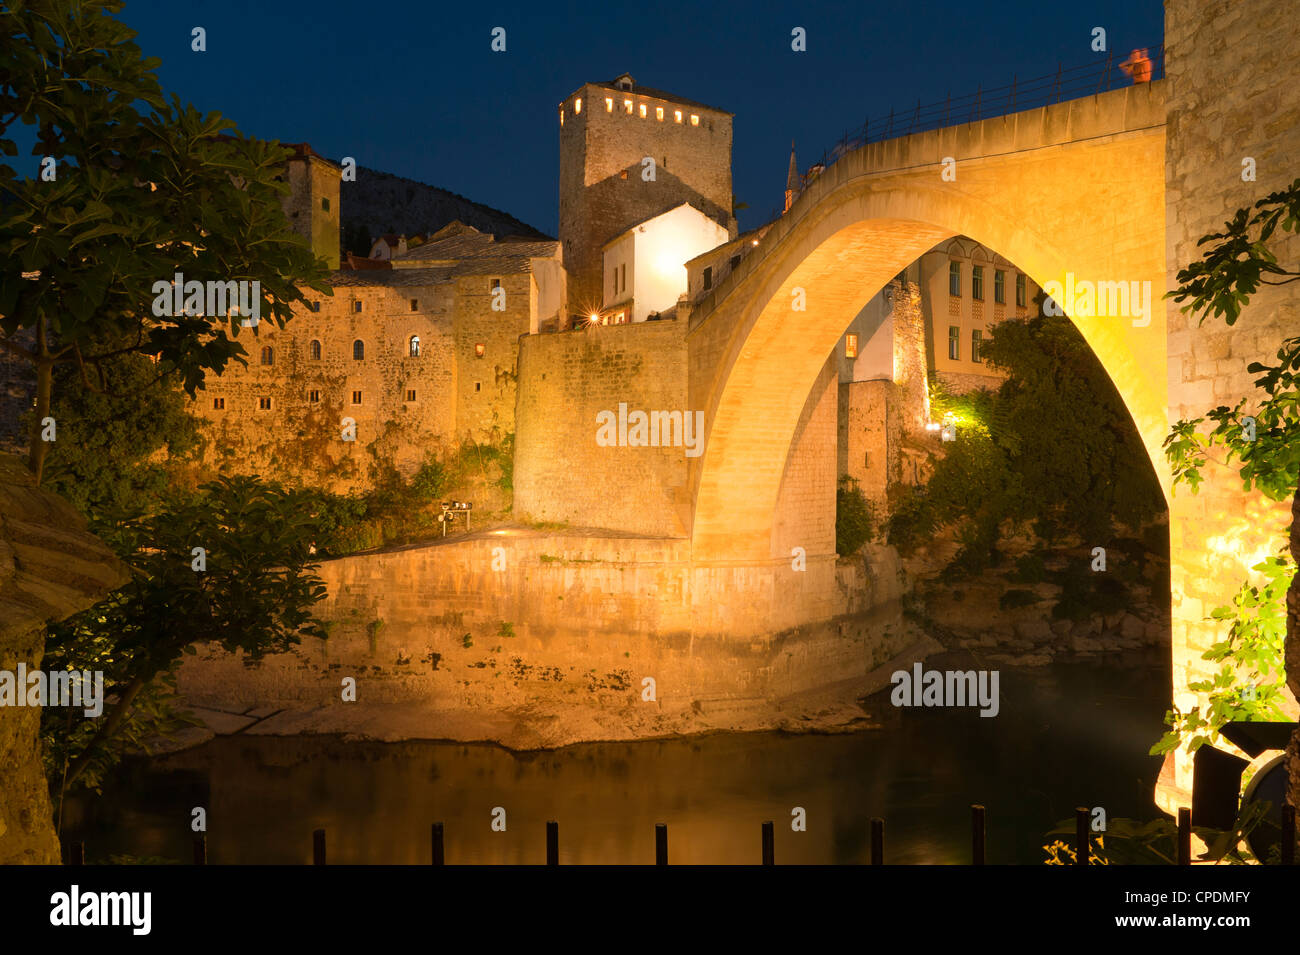 Stari Most (Old Bridge), UNESCO World Heritage Site, Mostar, municipality of Mostar, Bosnia and Herzegovina, Europe - Stock Image